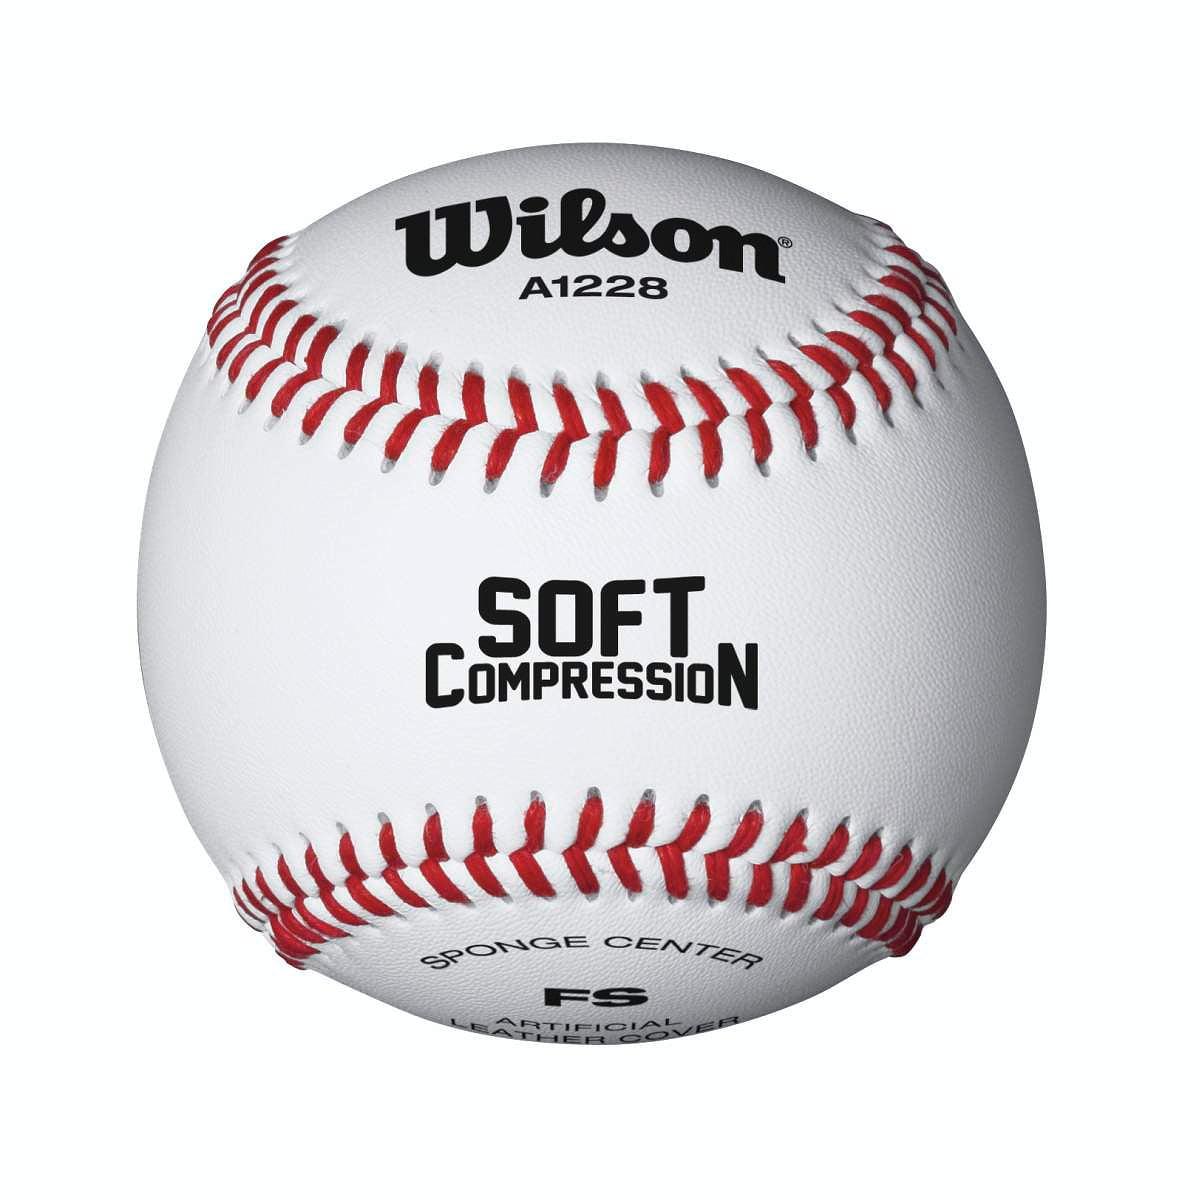 "Wilson A1228 One Dozen 9"" Soft Compression Baseballs"